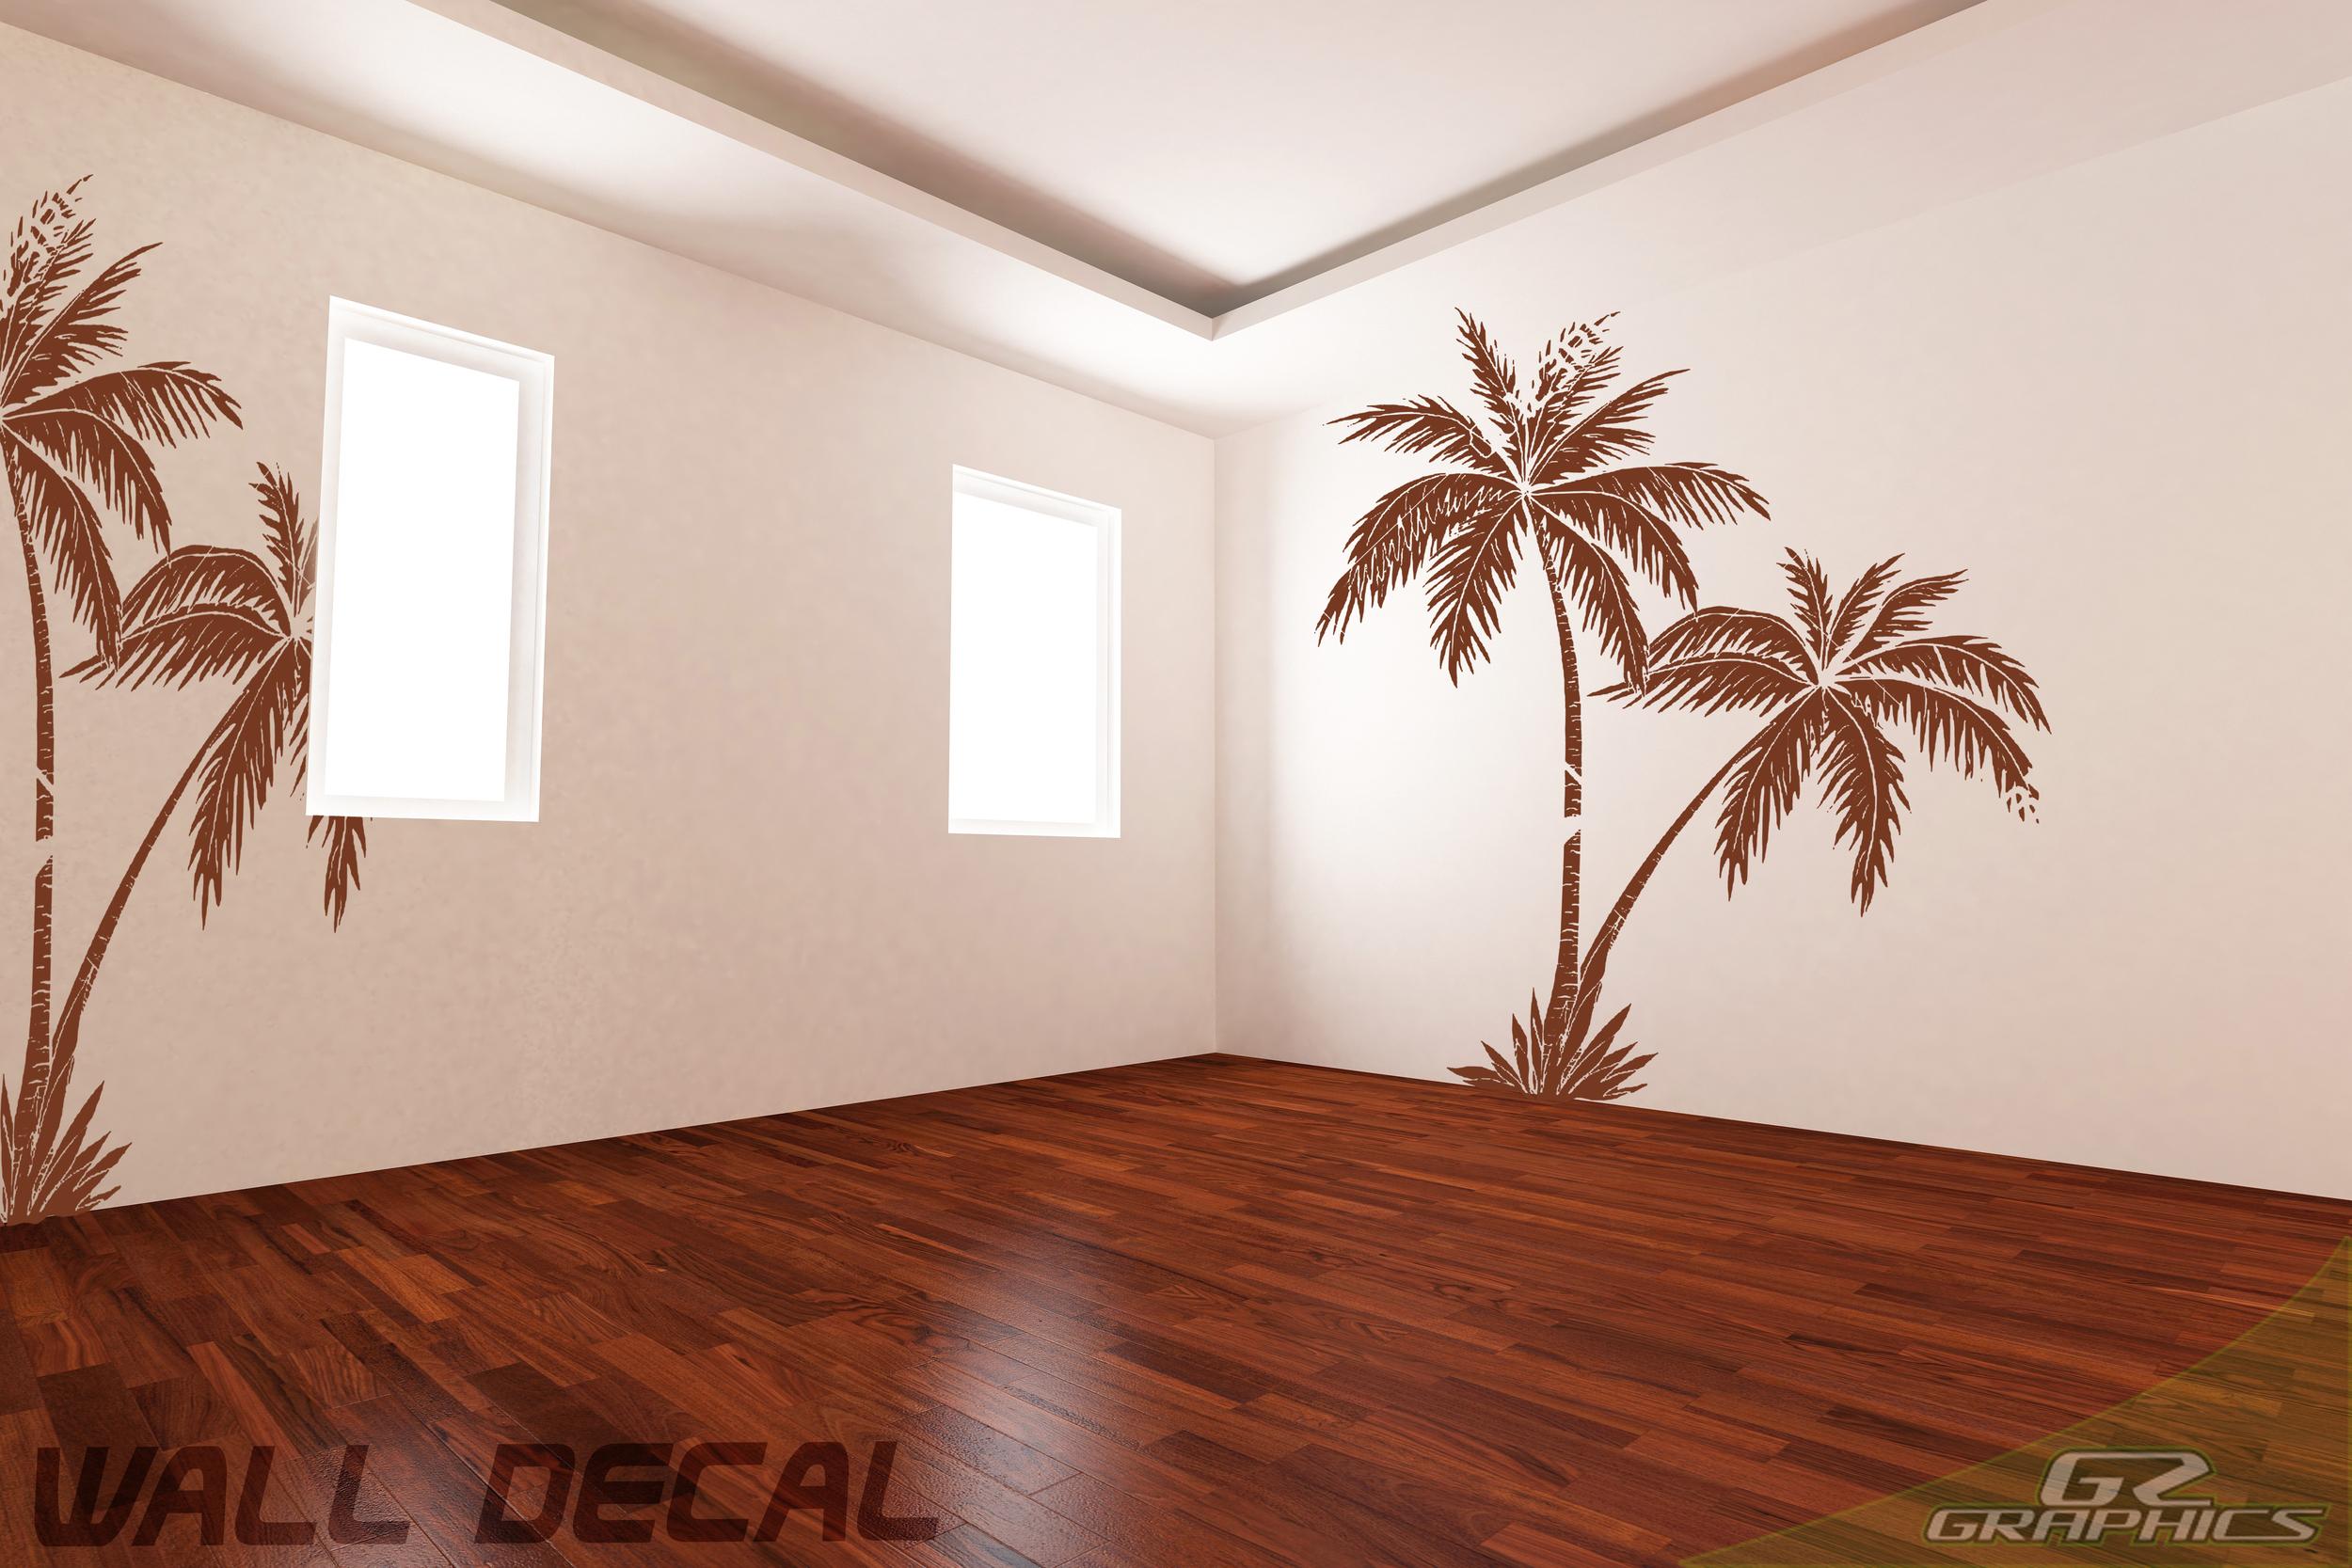 wall decal.jpg